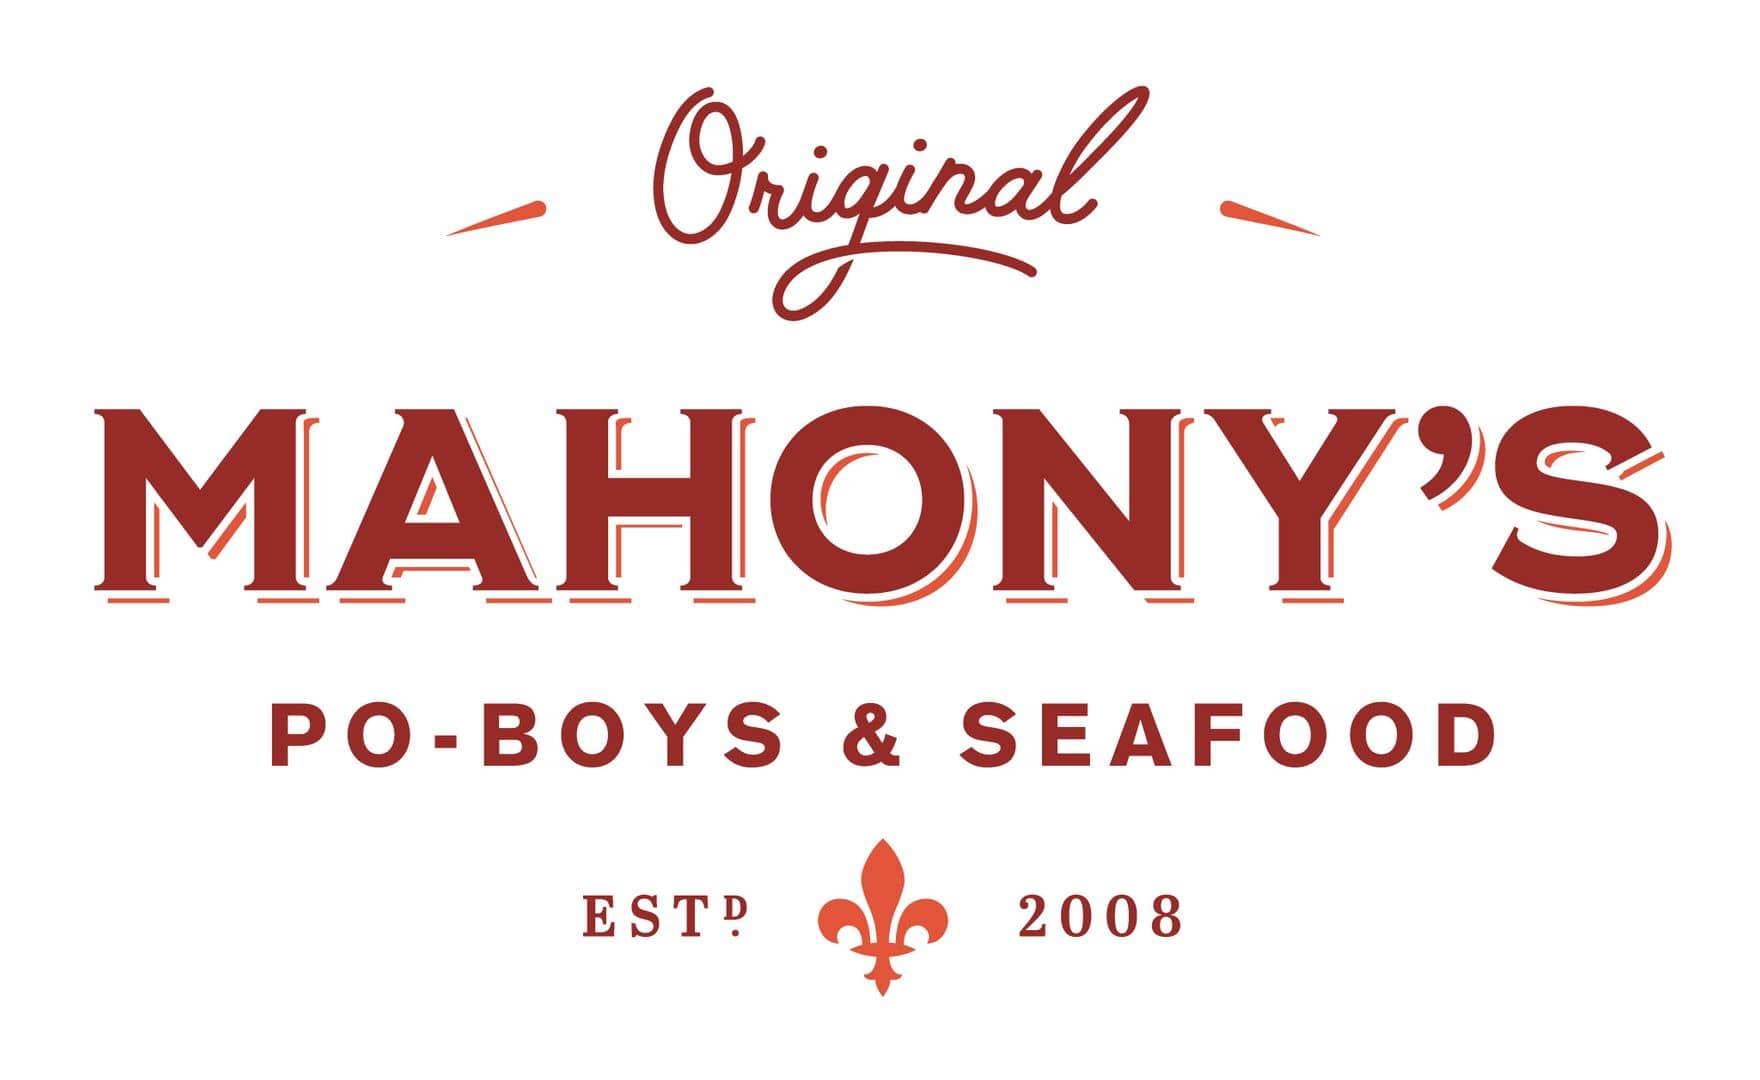 Mahony's Po-boys & Seafood image